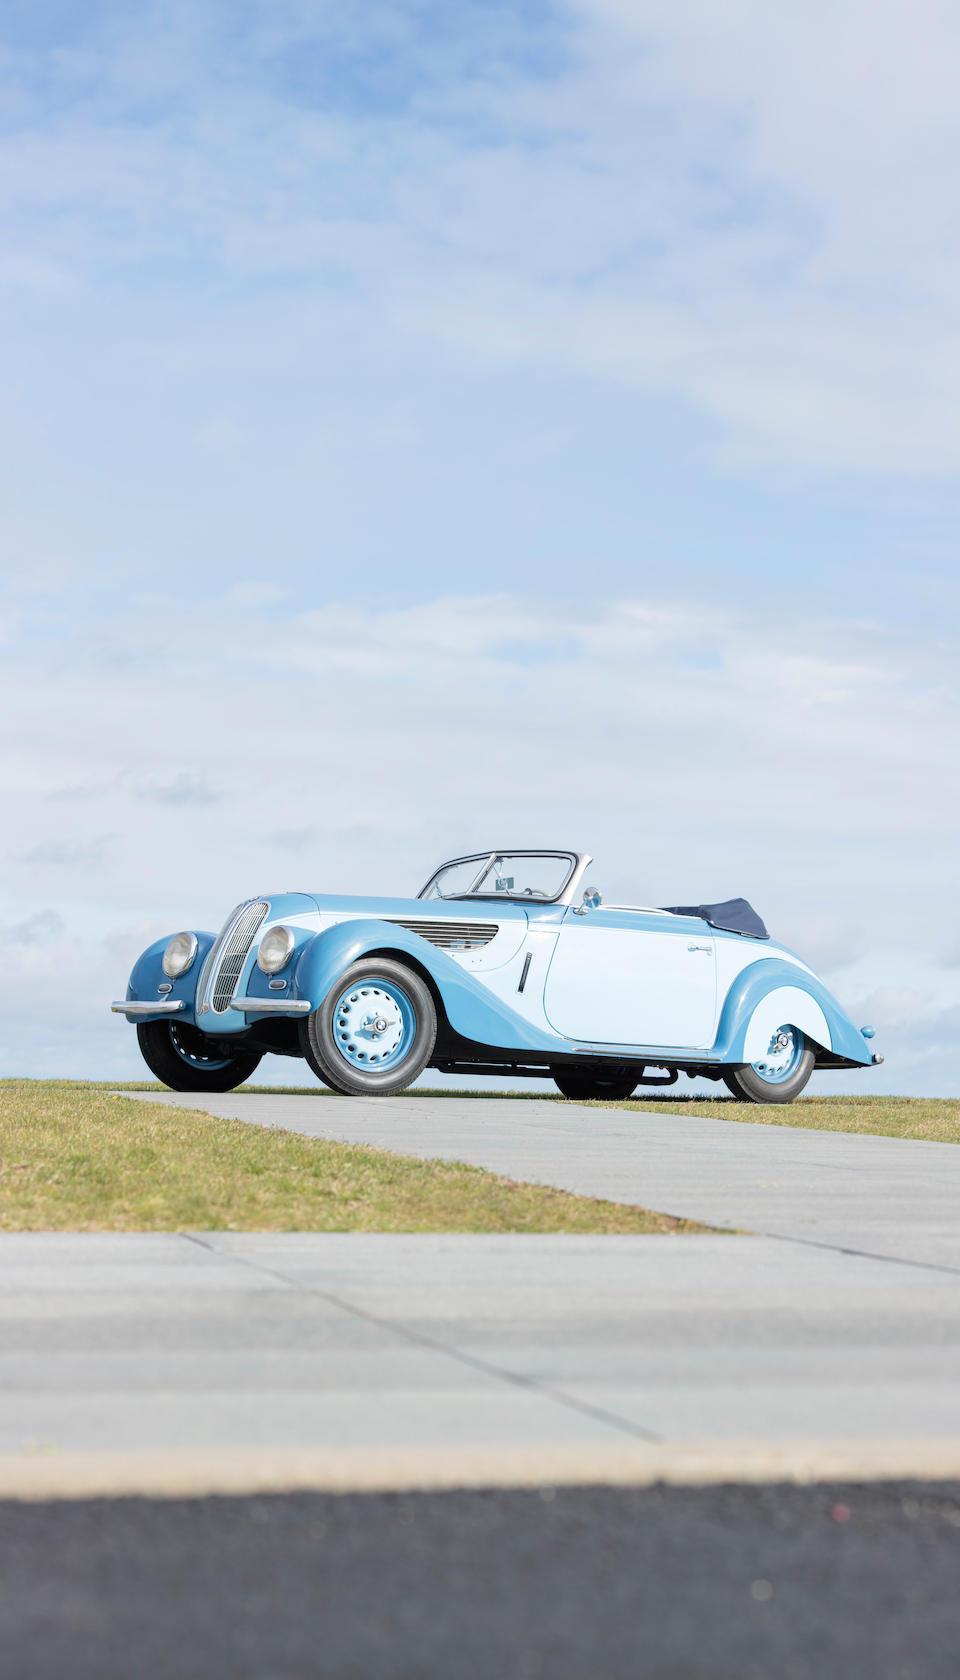 <b>1939 BMW 327/328 CABRIOLET</b><br />Chassis no. 74582<br />Engine no. 1111864